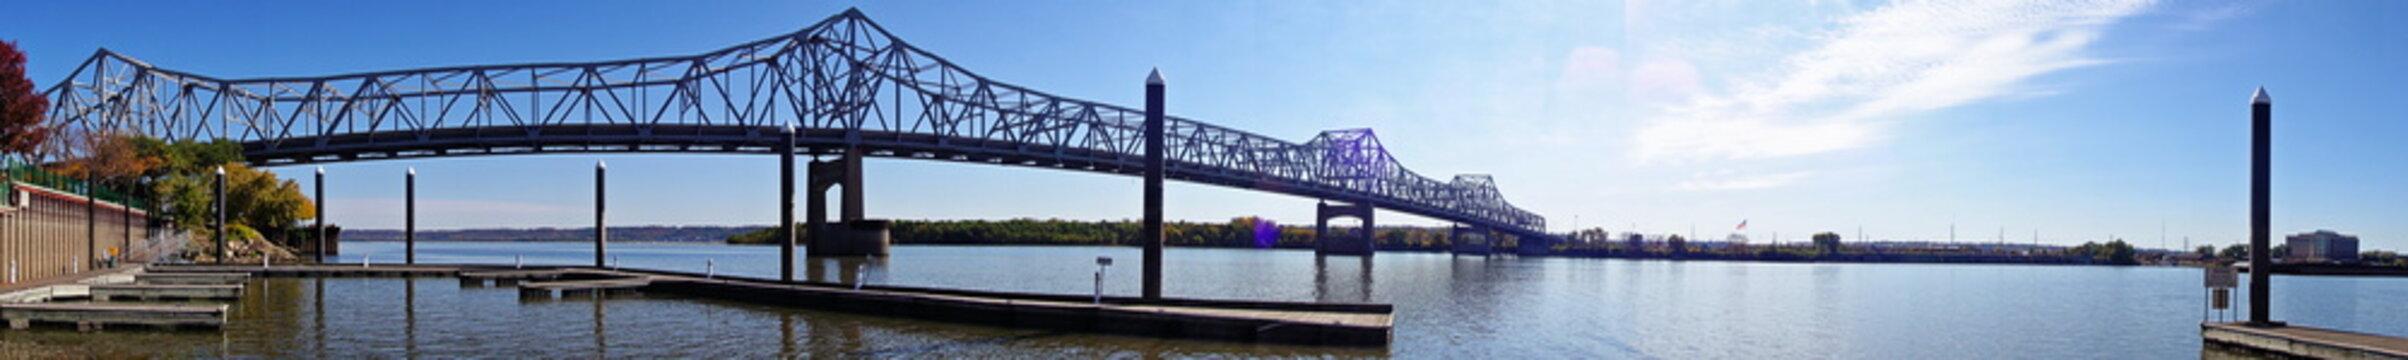 Horizontal panorama of a steel bridge in Youngstown Ohio.